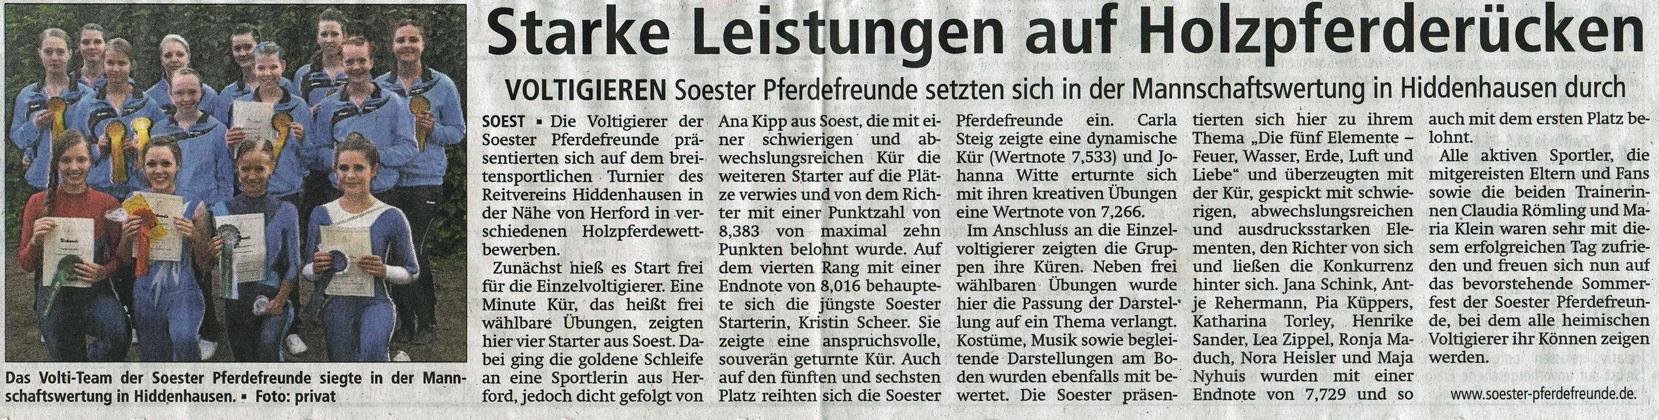 Zeitung_2014_06_23_bearbeitet